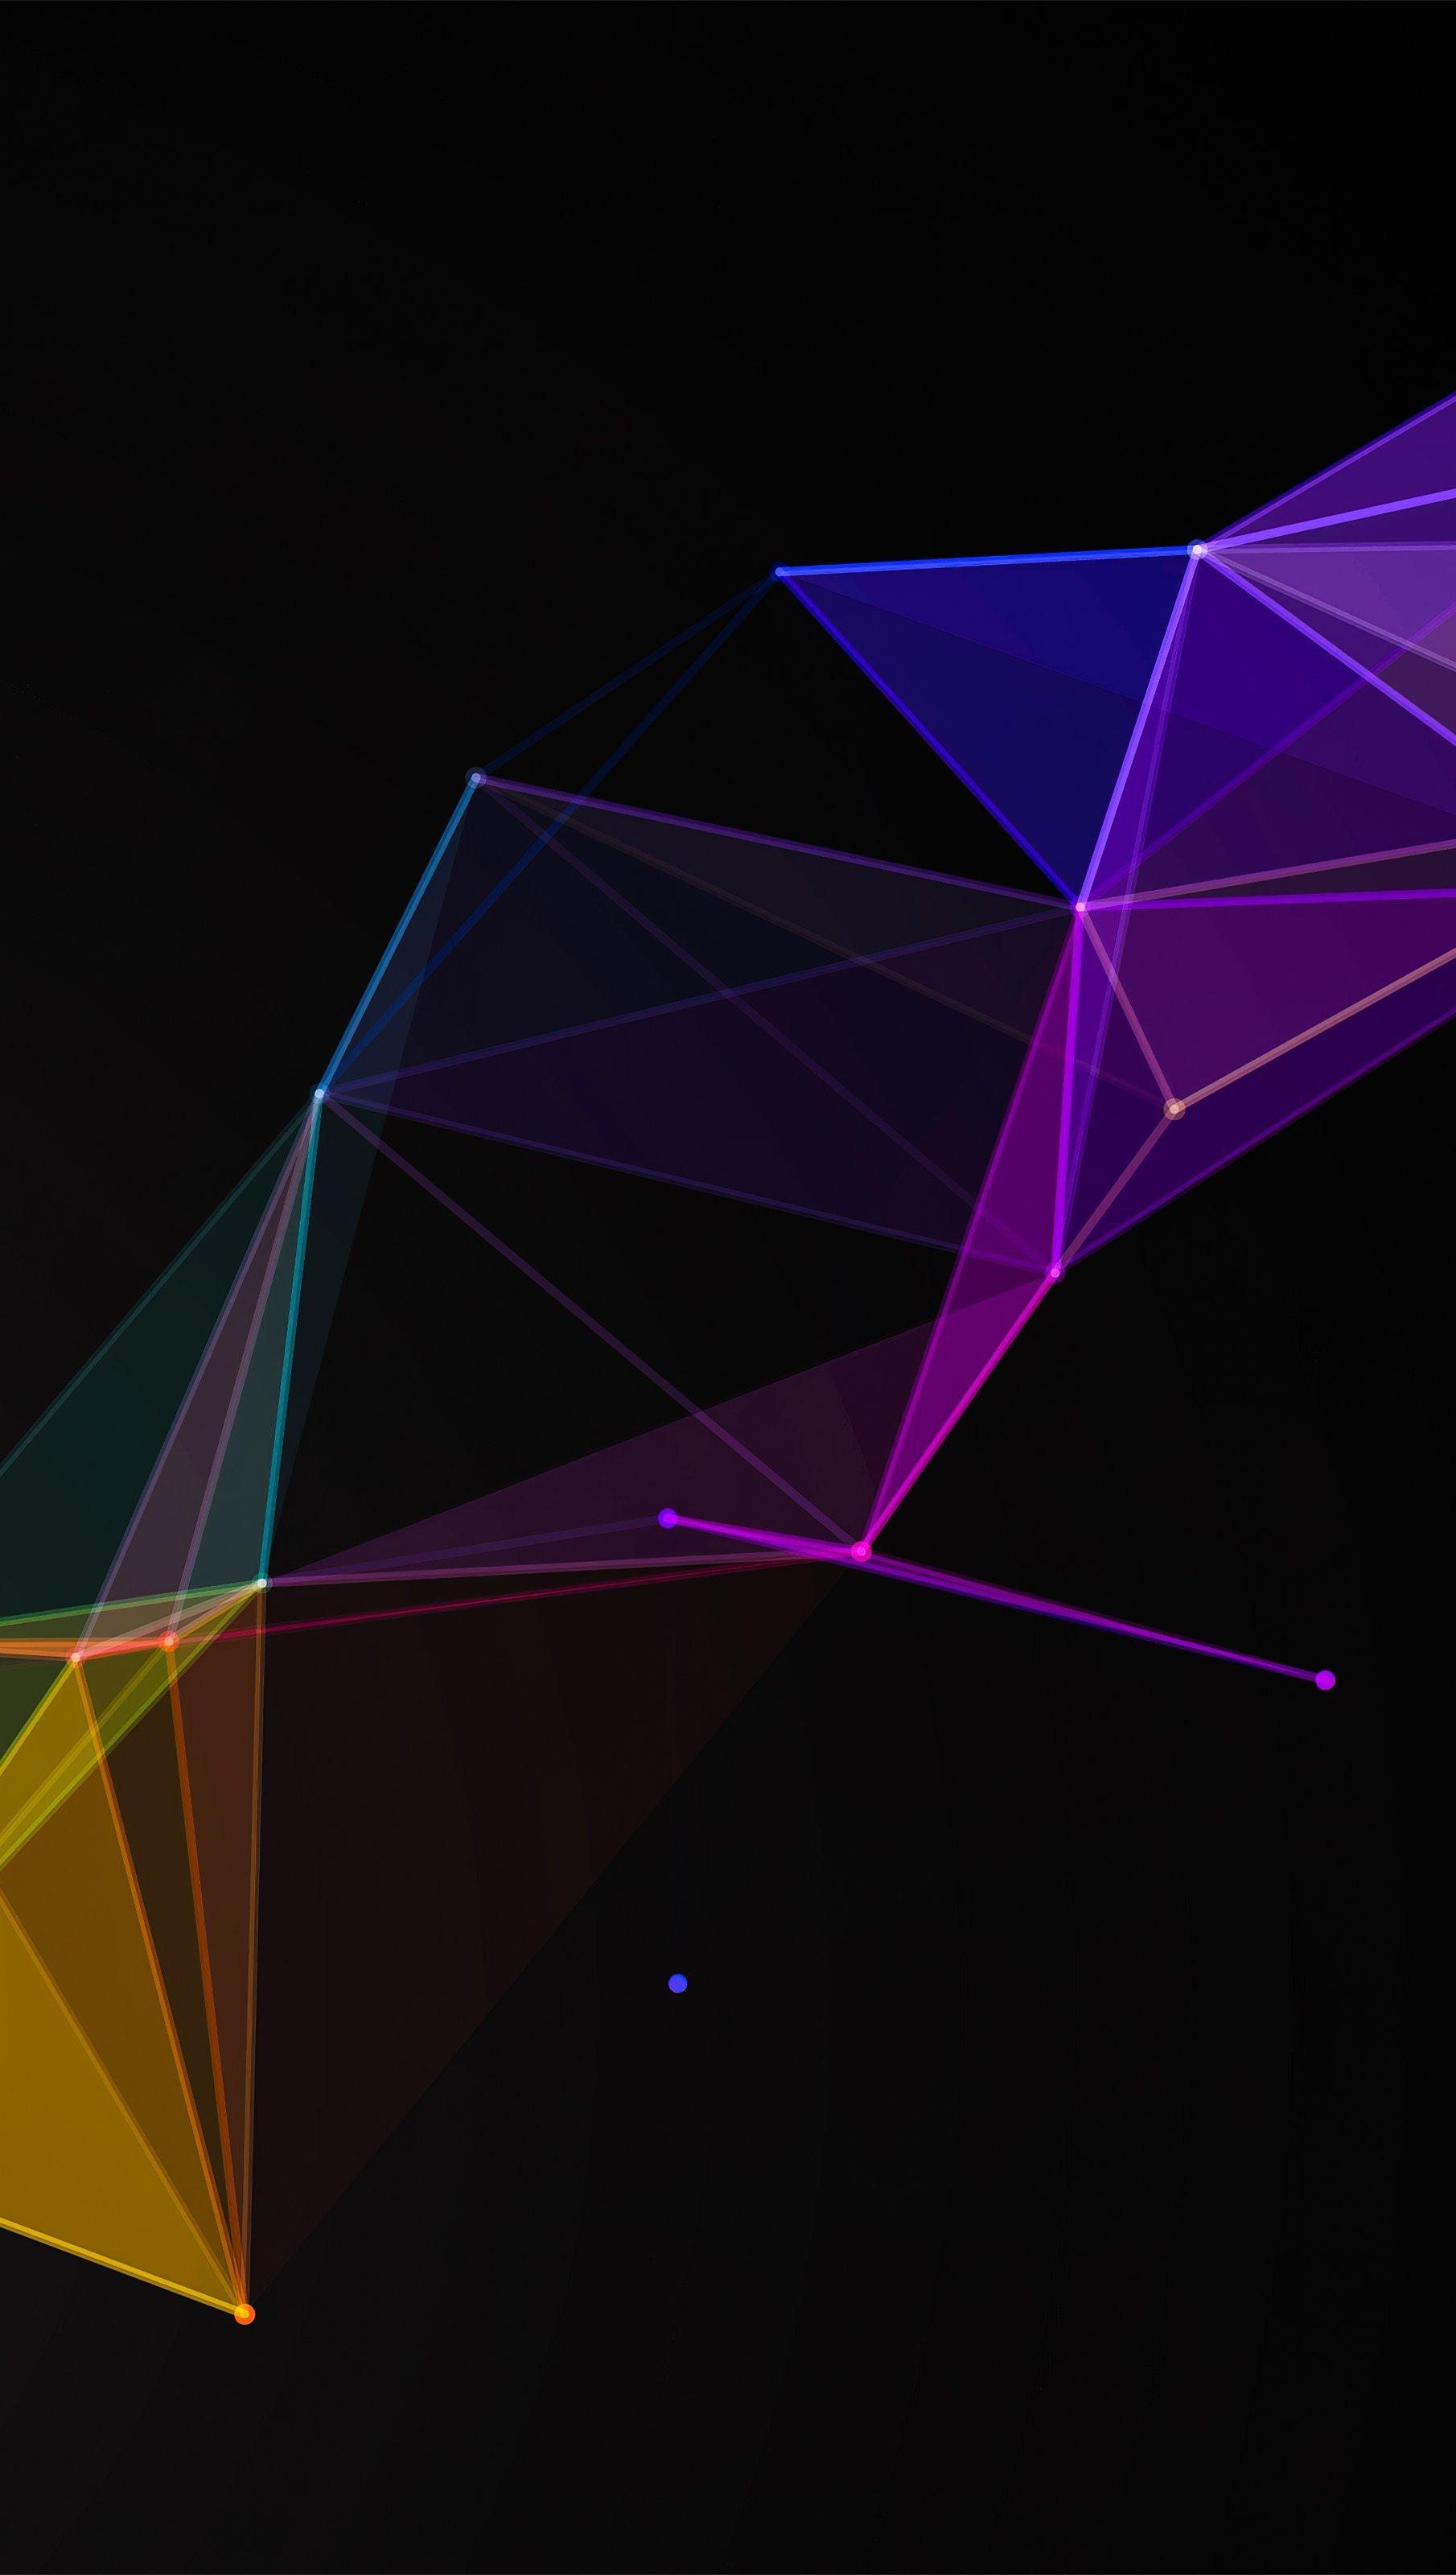 Fondos de pantalla Figuras geometricas en bucle Vertical